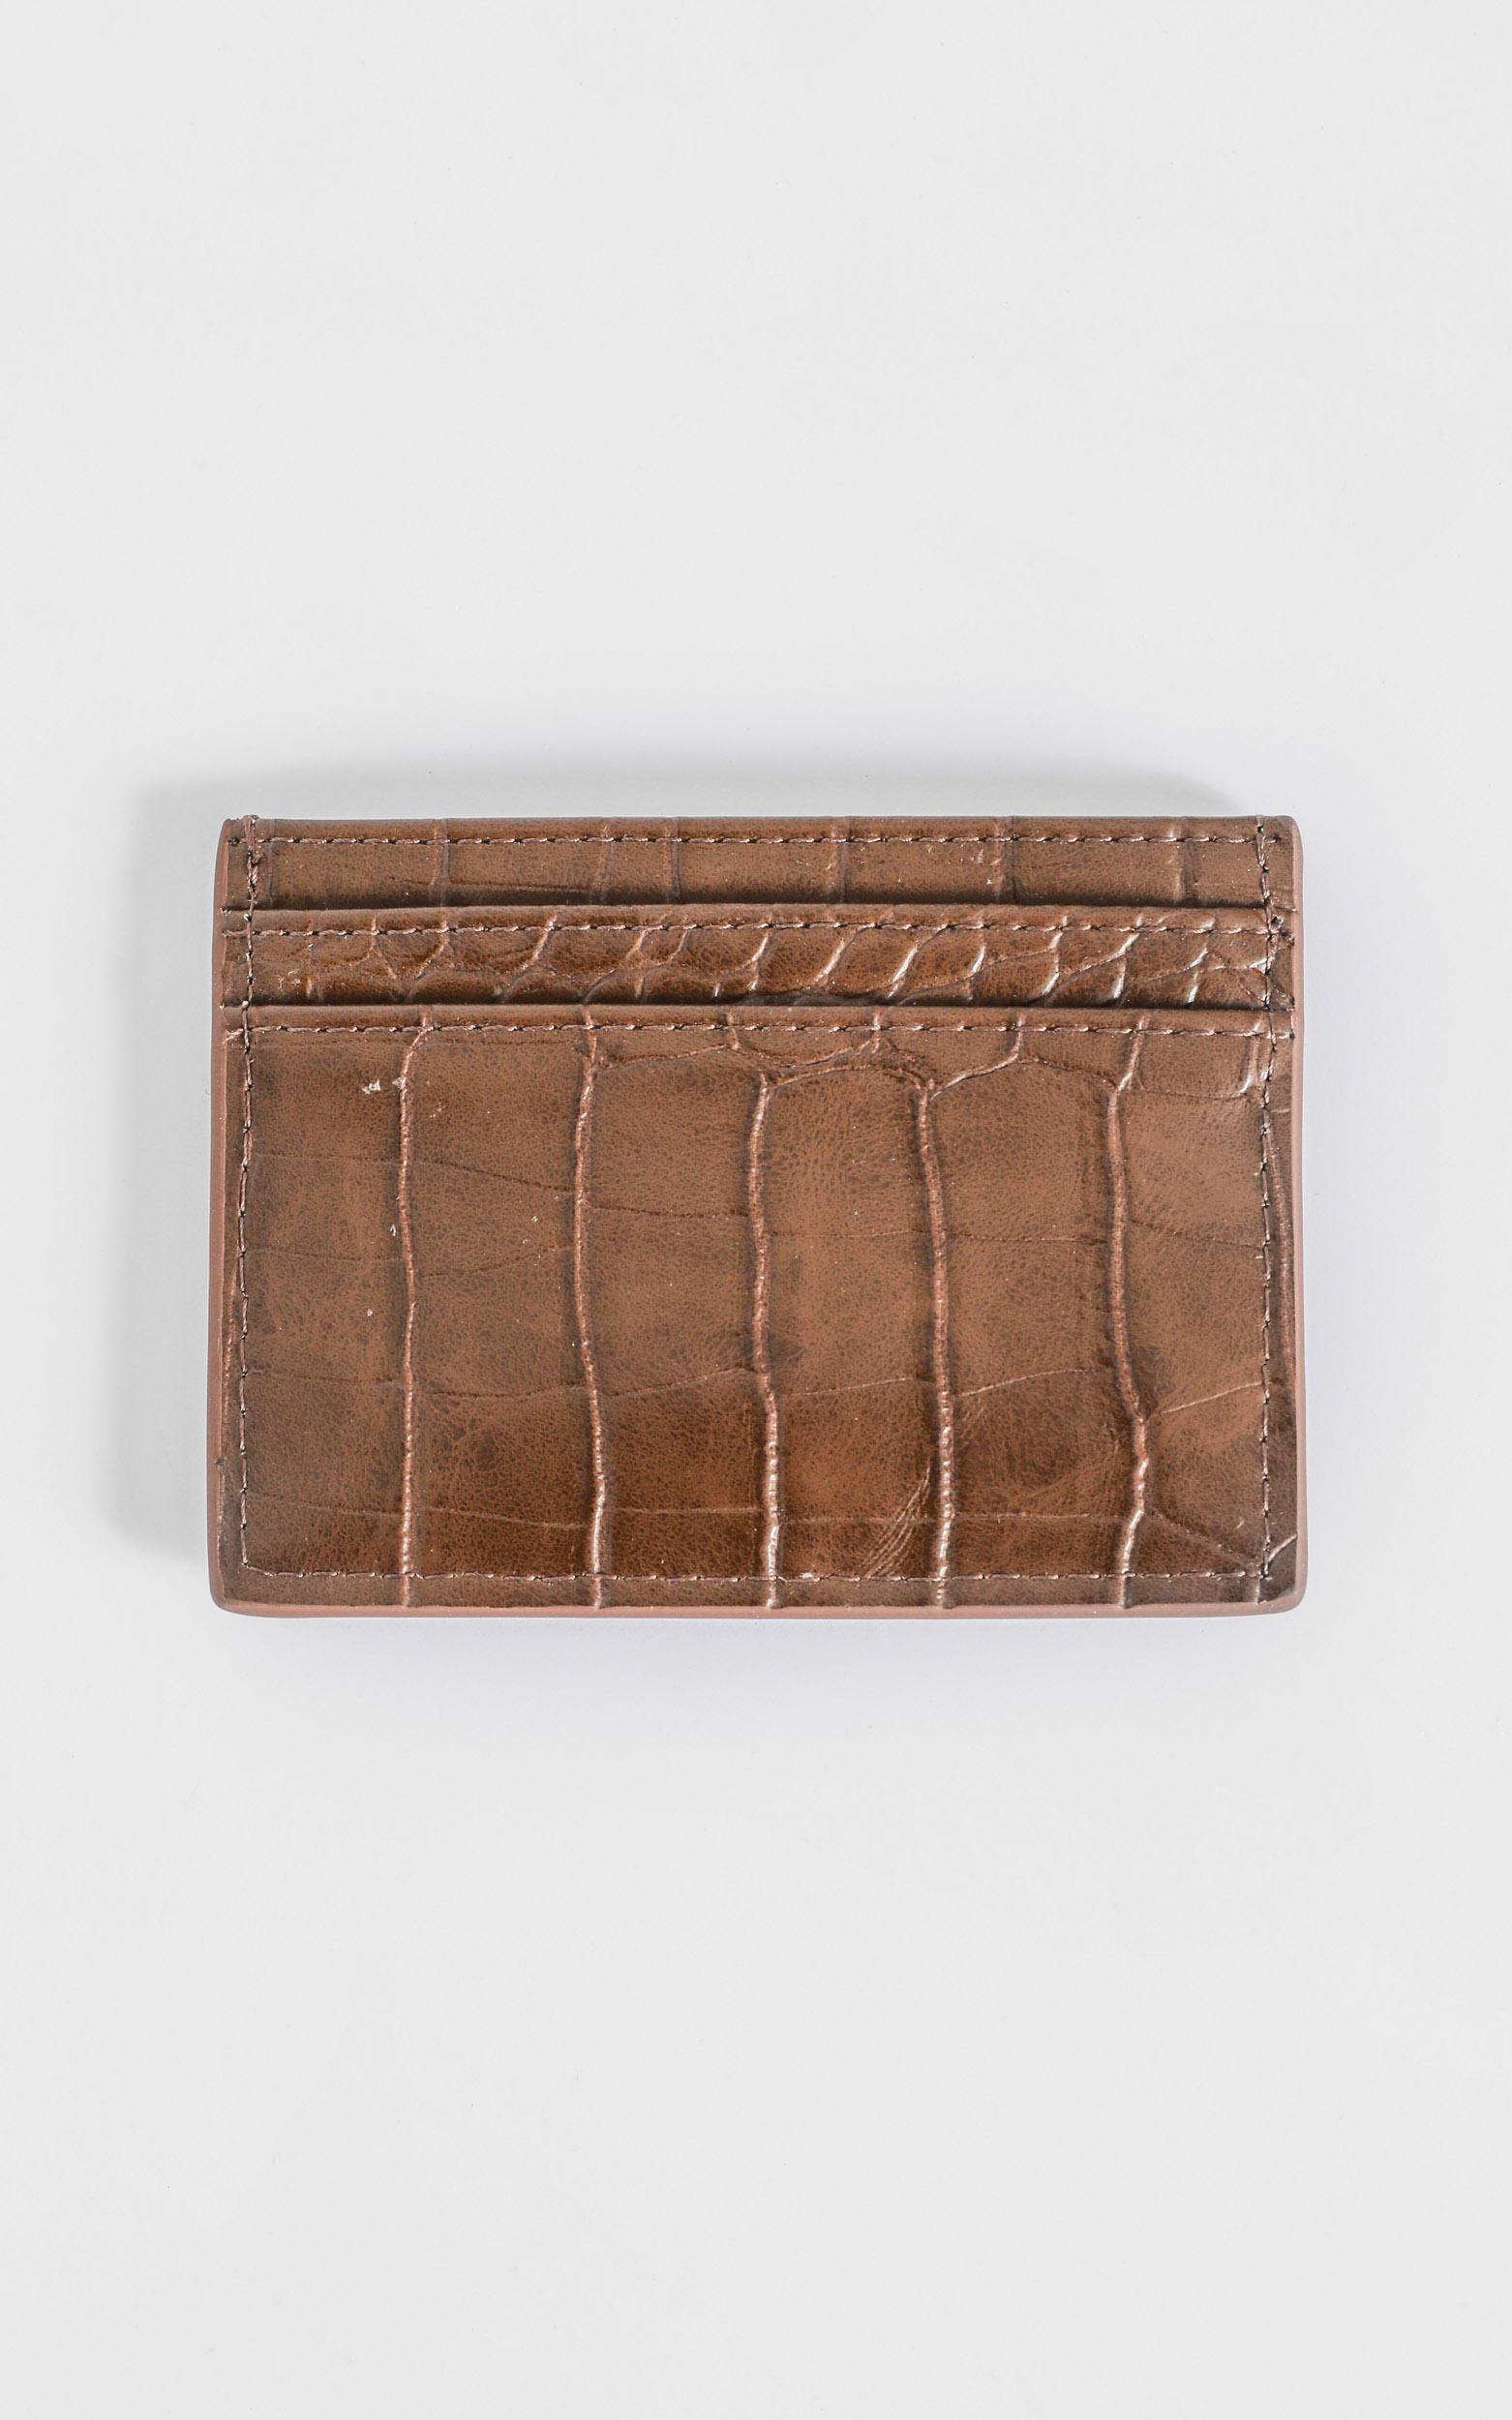 Peta and Jain - Izzy Card Holder in Chocolate Croc, Brown, hi-res image number null